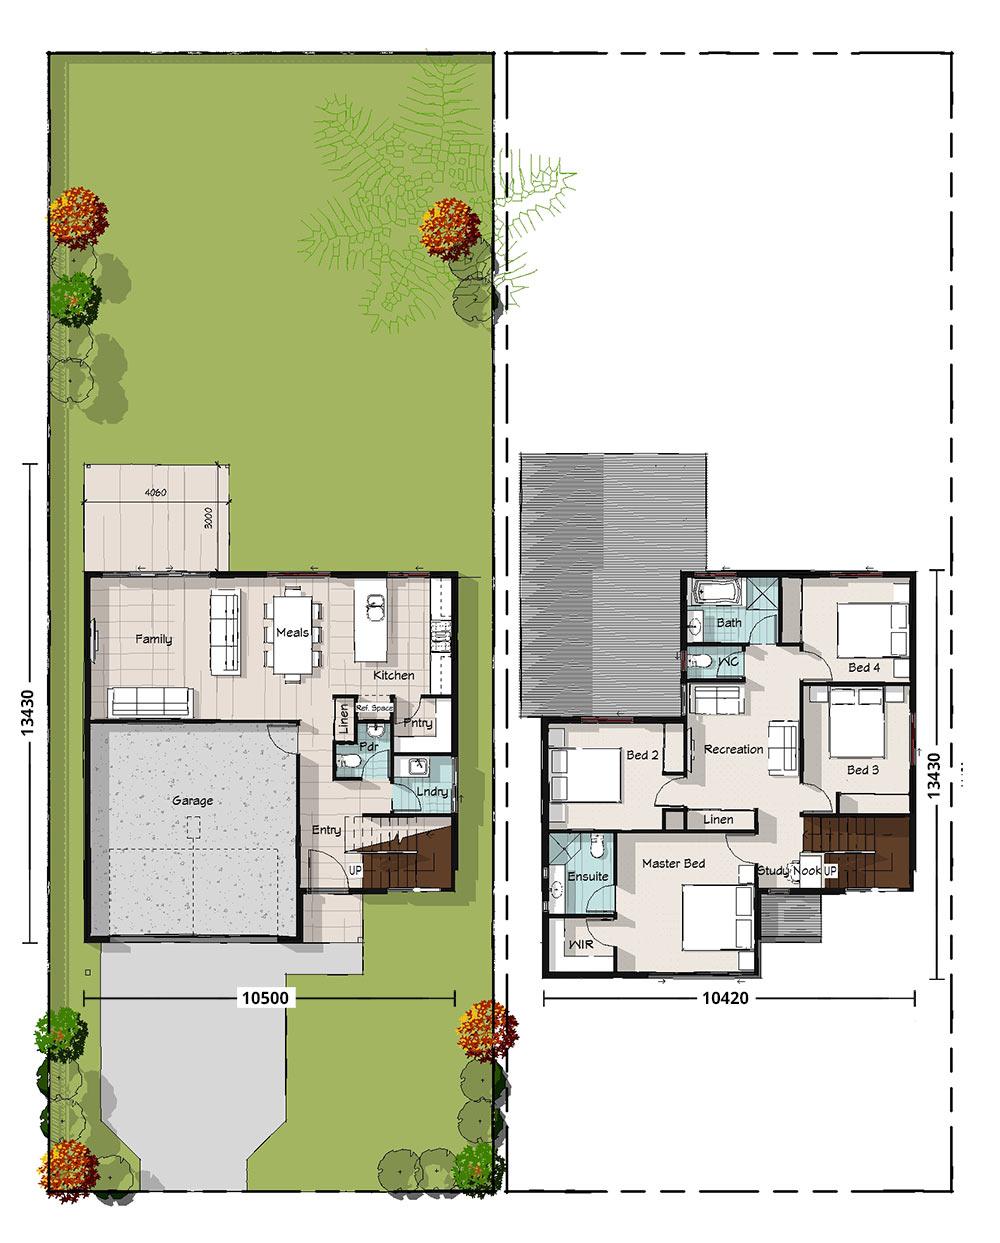 Kingfisher Floorplan